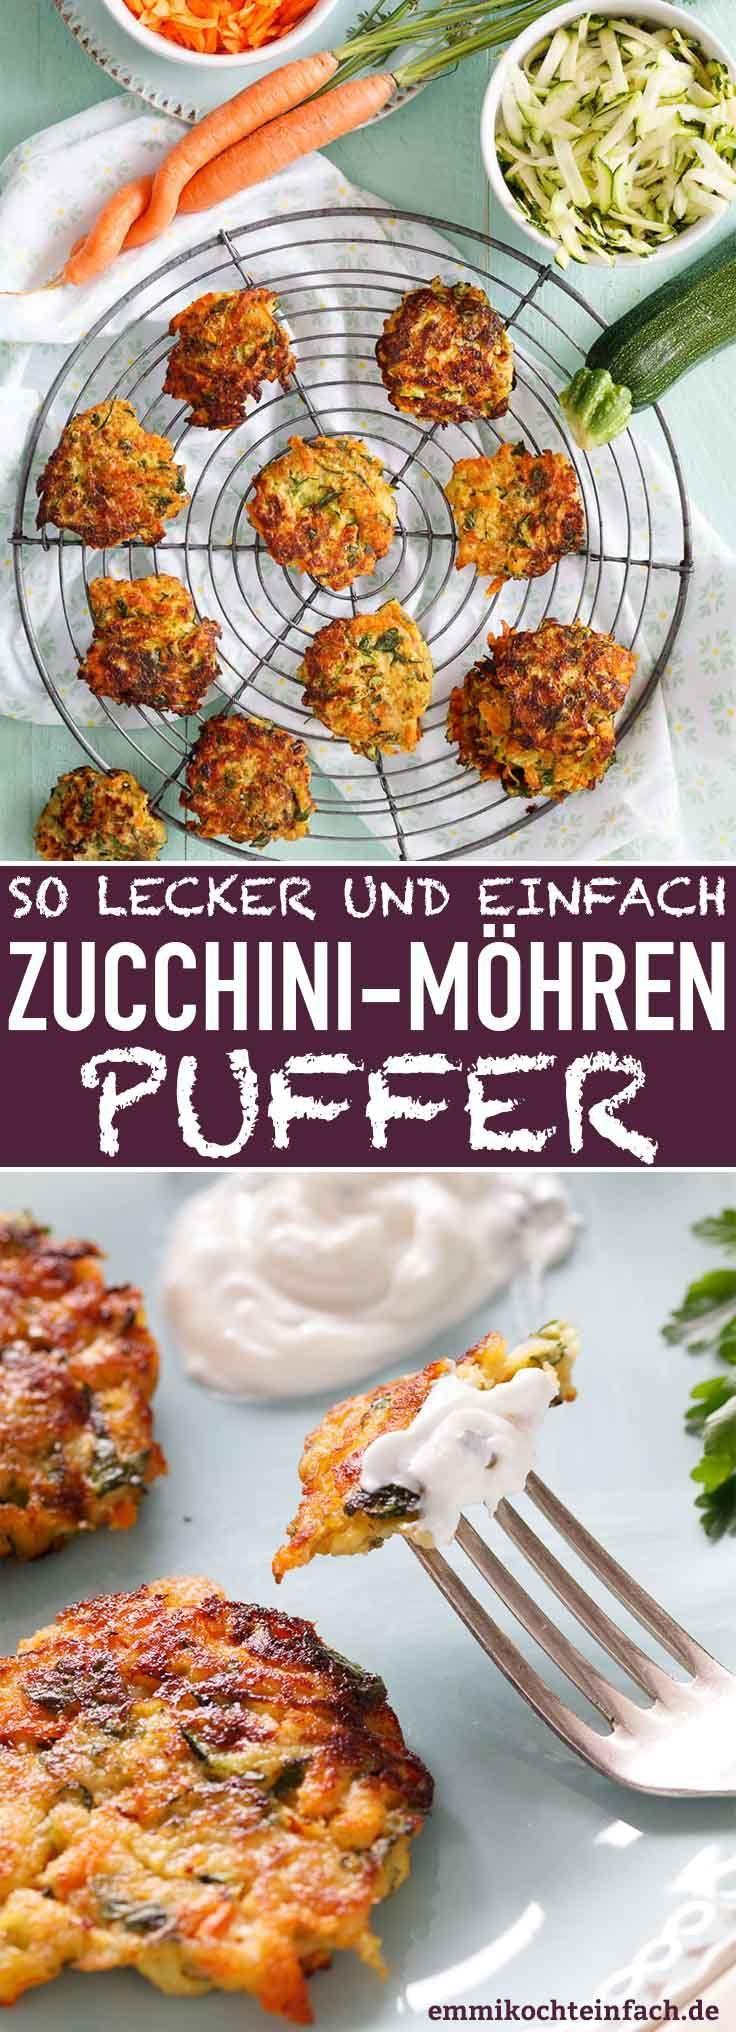 Zucchini Möhren Puffer – die leckeren Gemüsepuffer